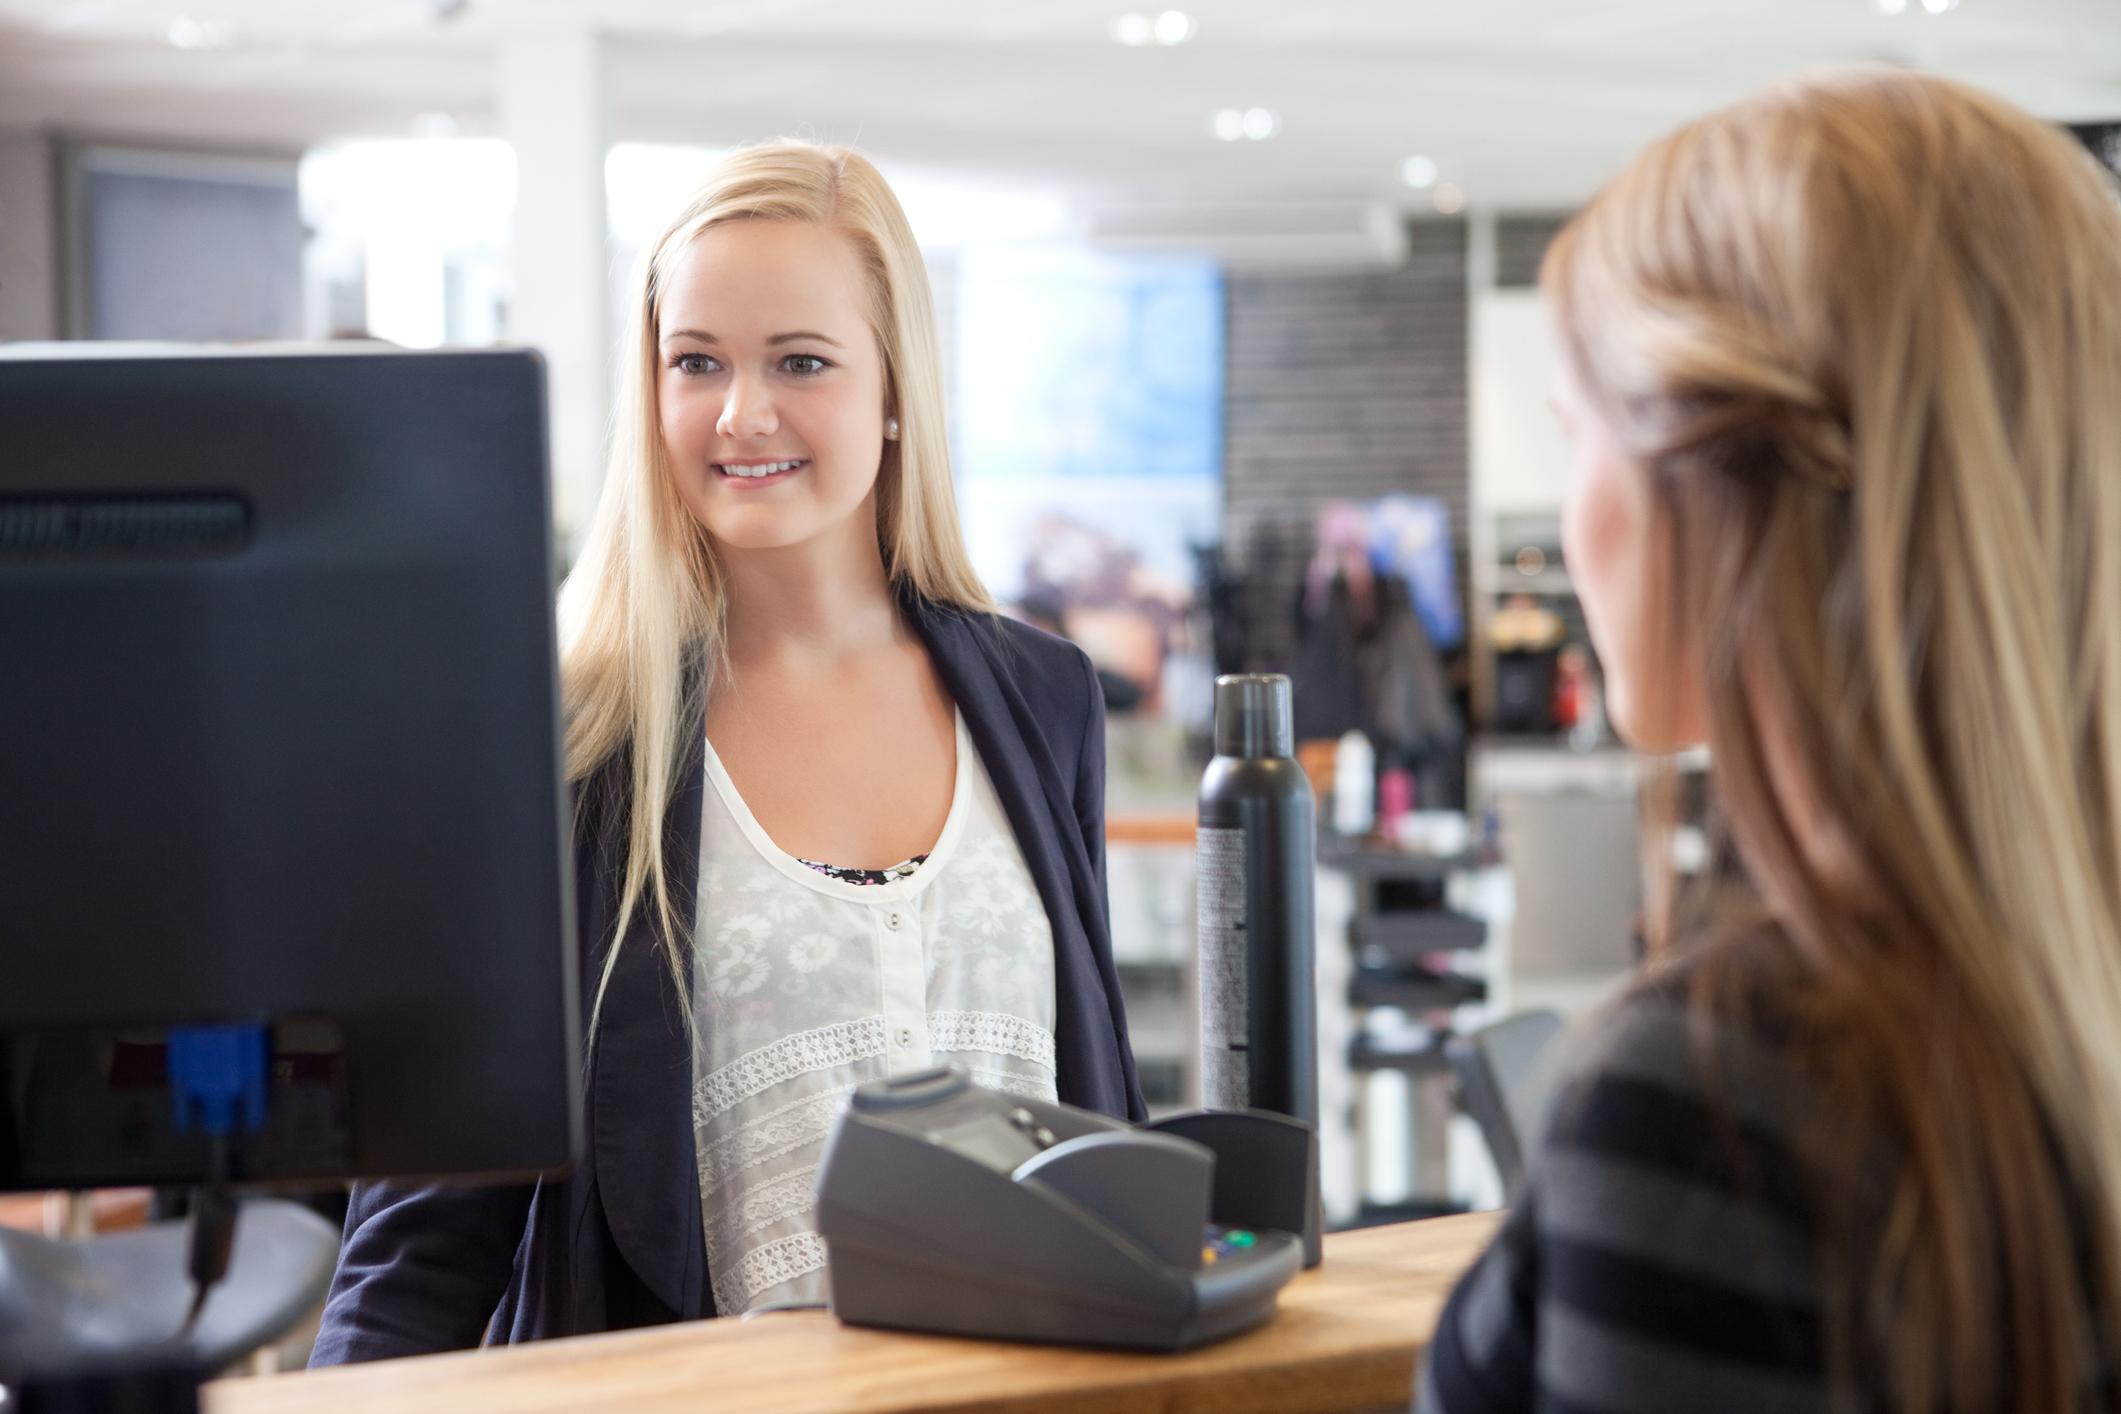 A customer checks out beauty supplies.